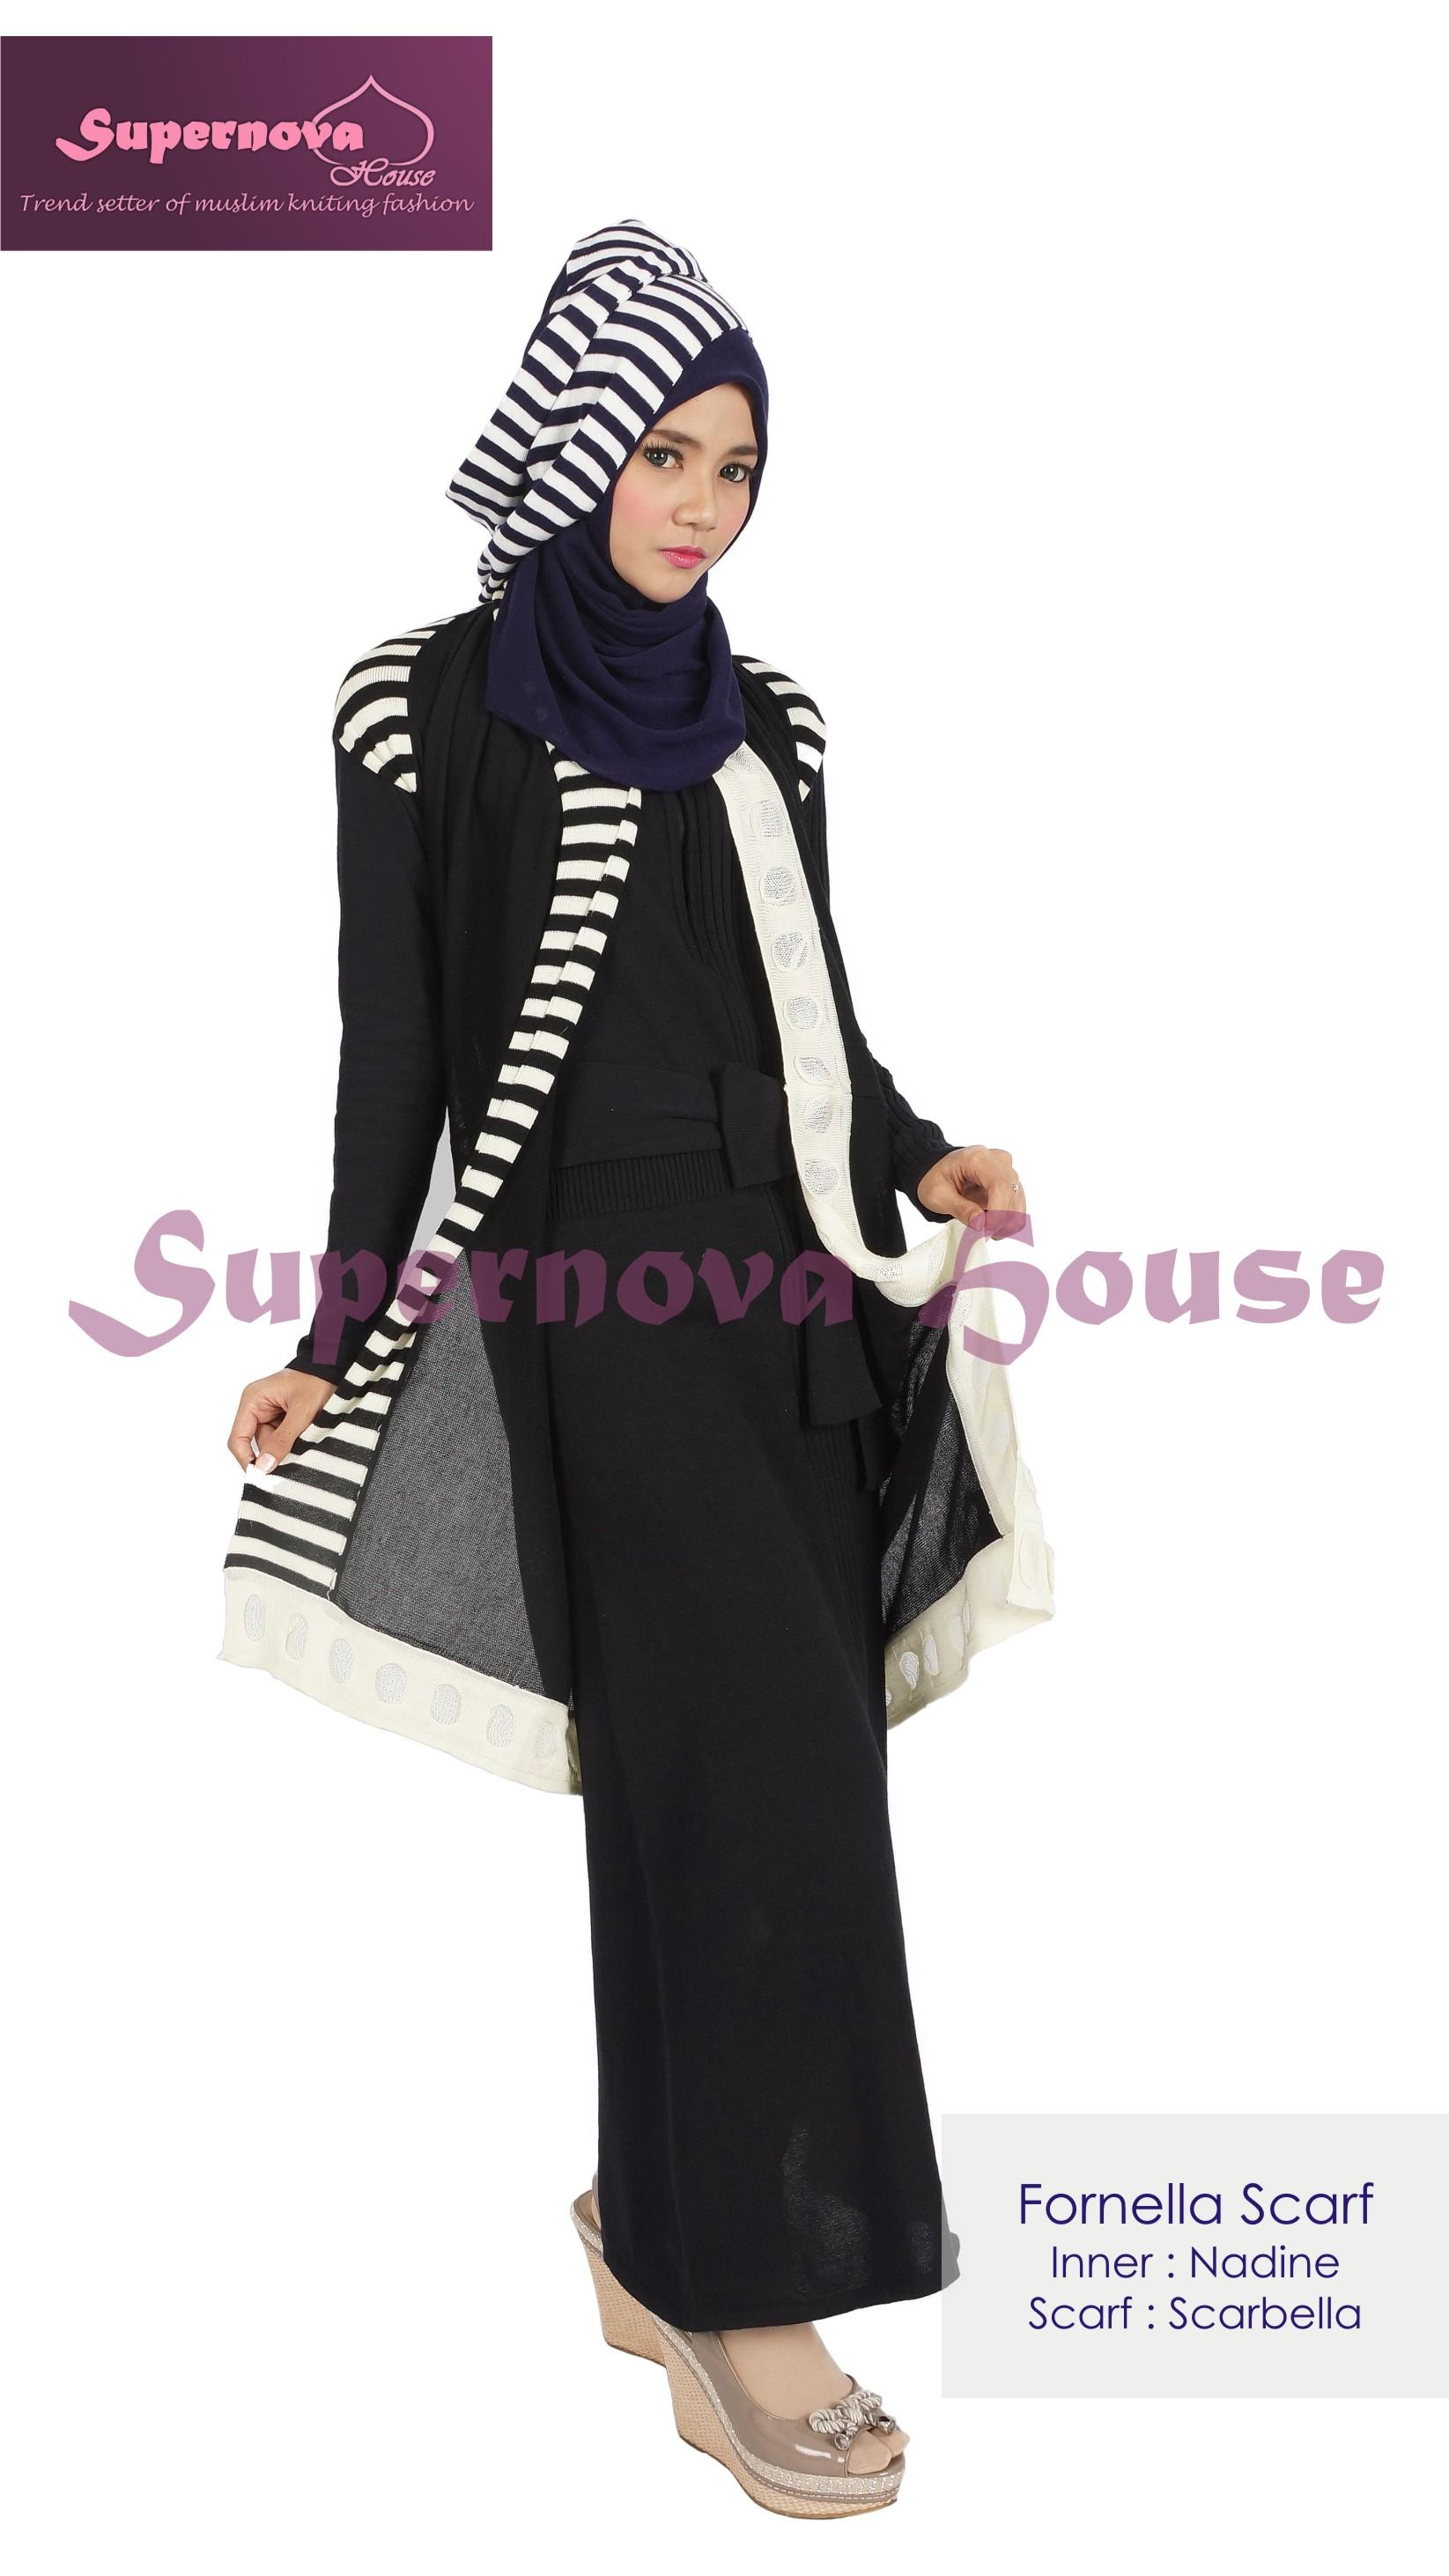 Fornella Scarf Hitam Off White Baju Muslim Gamis Modern